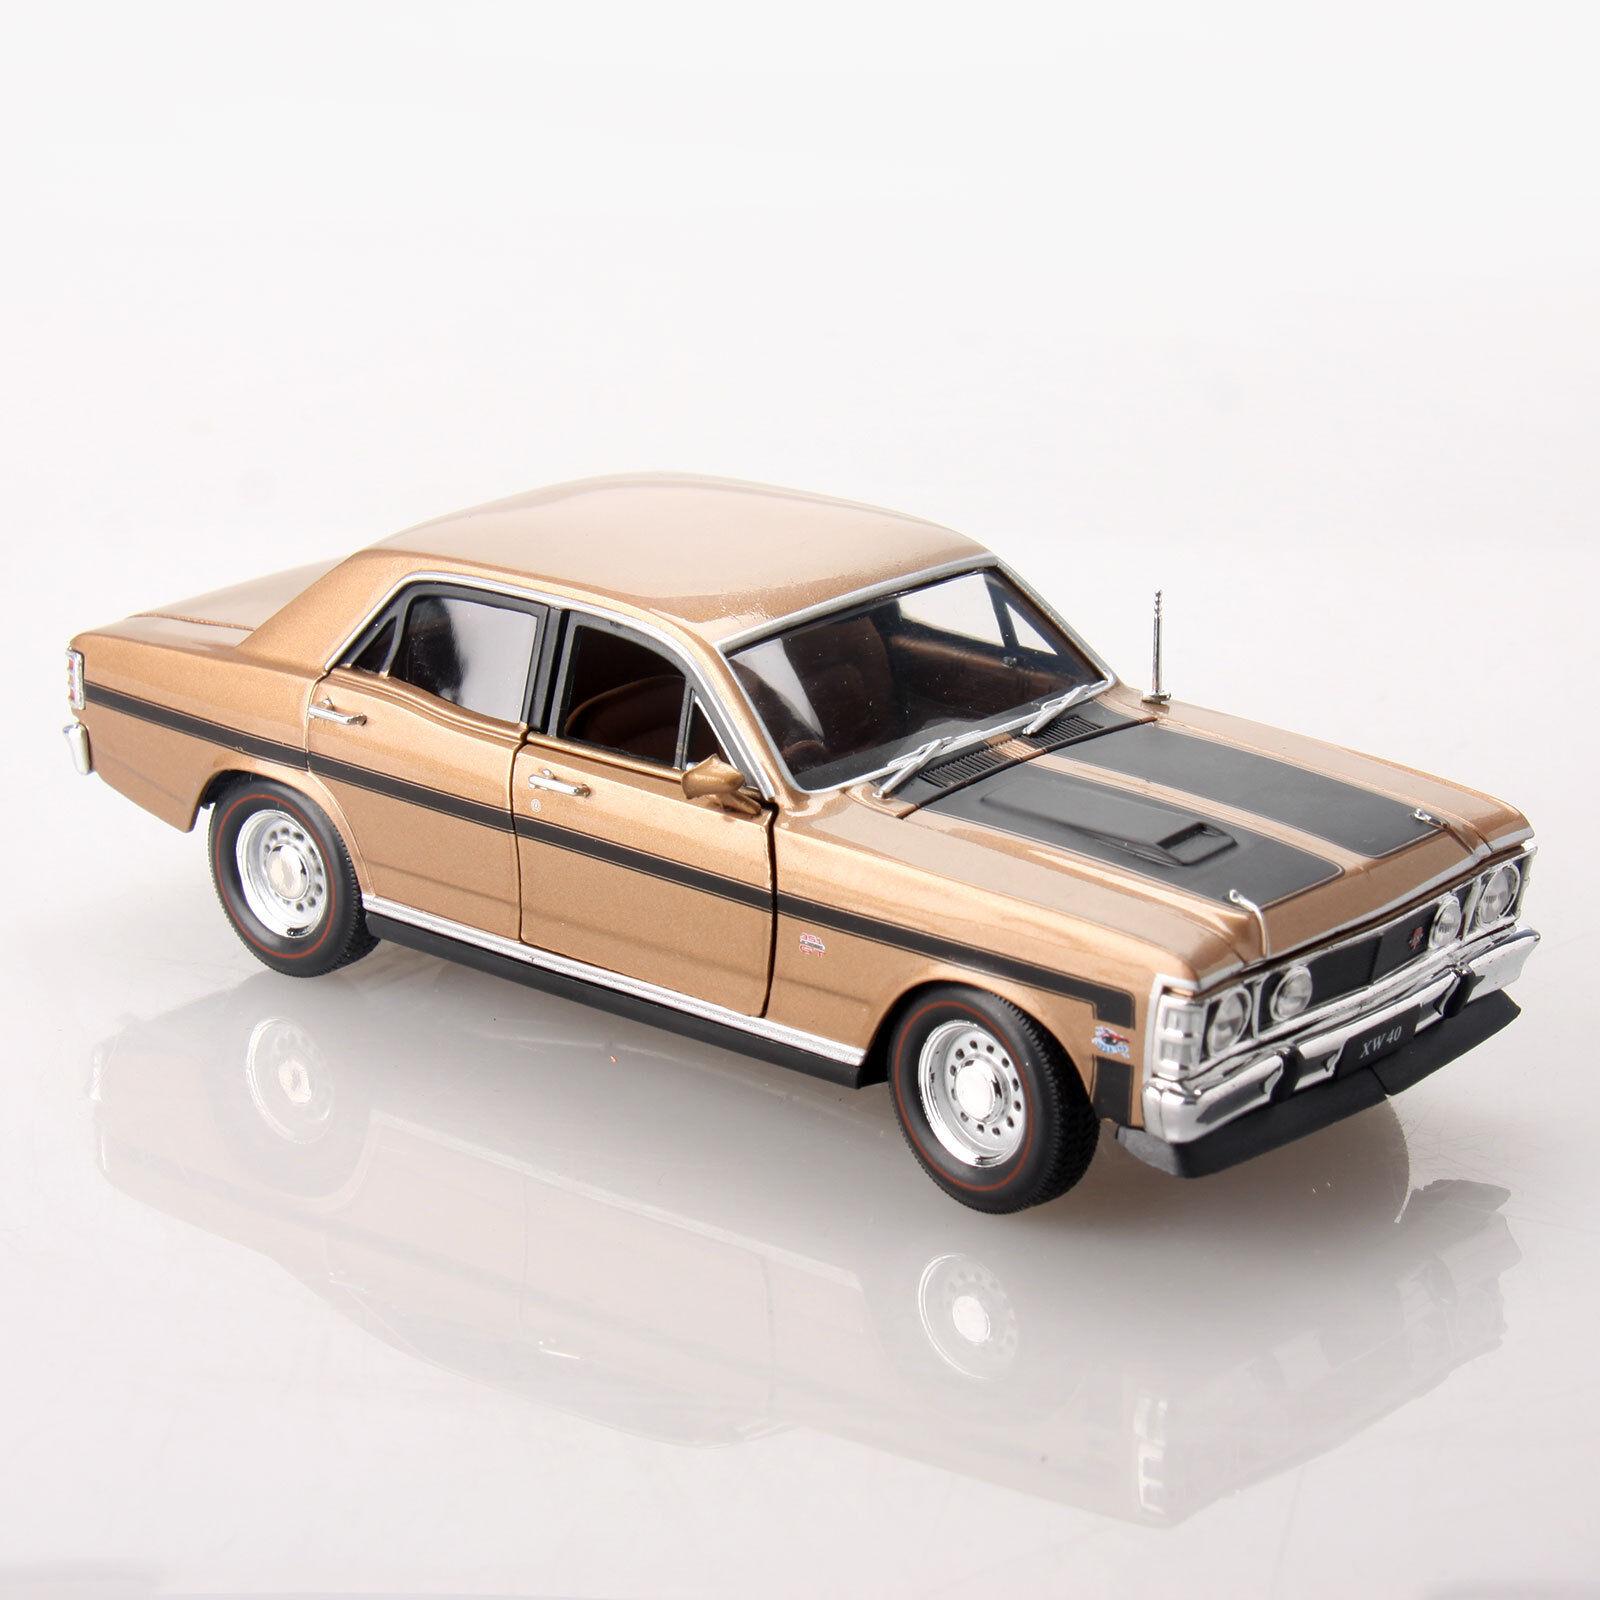 Ford Falcon XW GT HO 351 1 32 Scale Aussie Classic Diecast Car Grecian gold